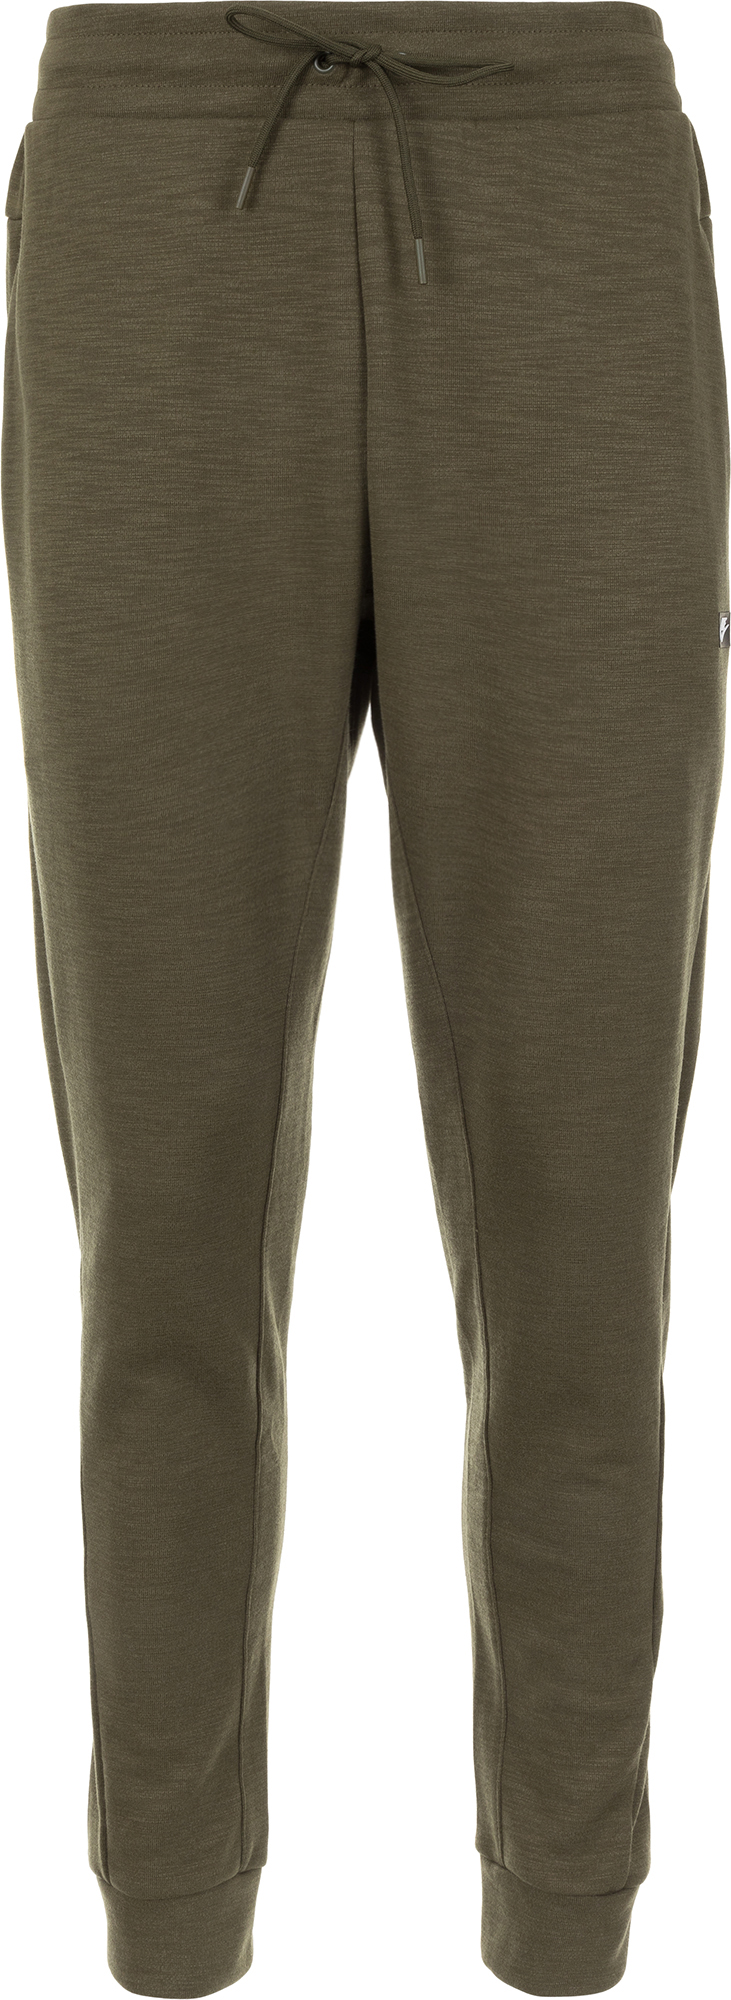 Nike Брюки мужские Nike Sportswear Optic, размер 52-54 nike брюки мужские nike sportswear